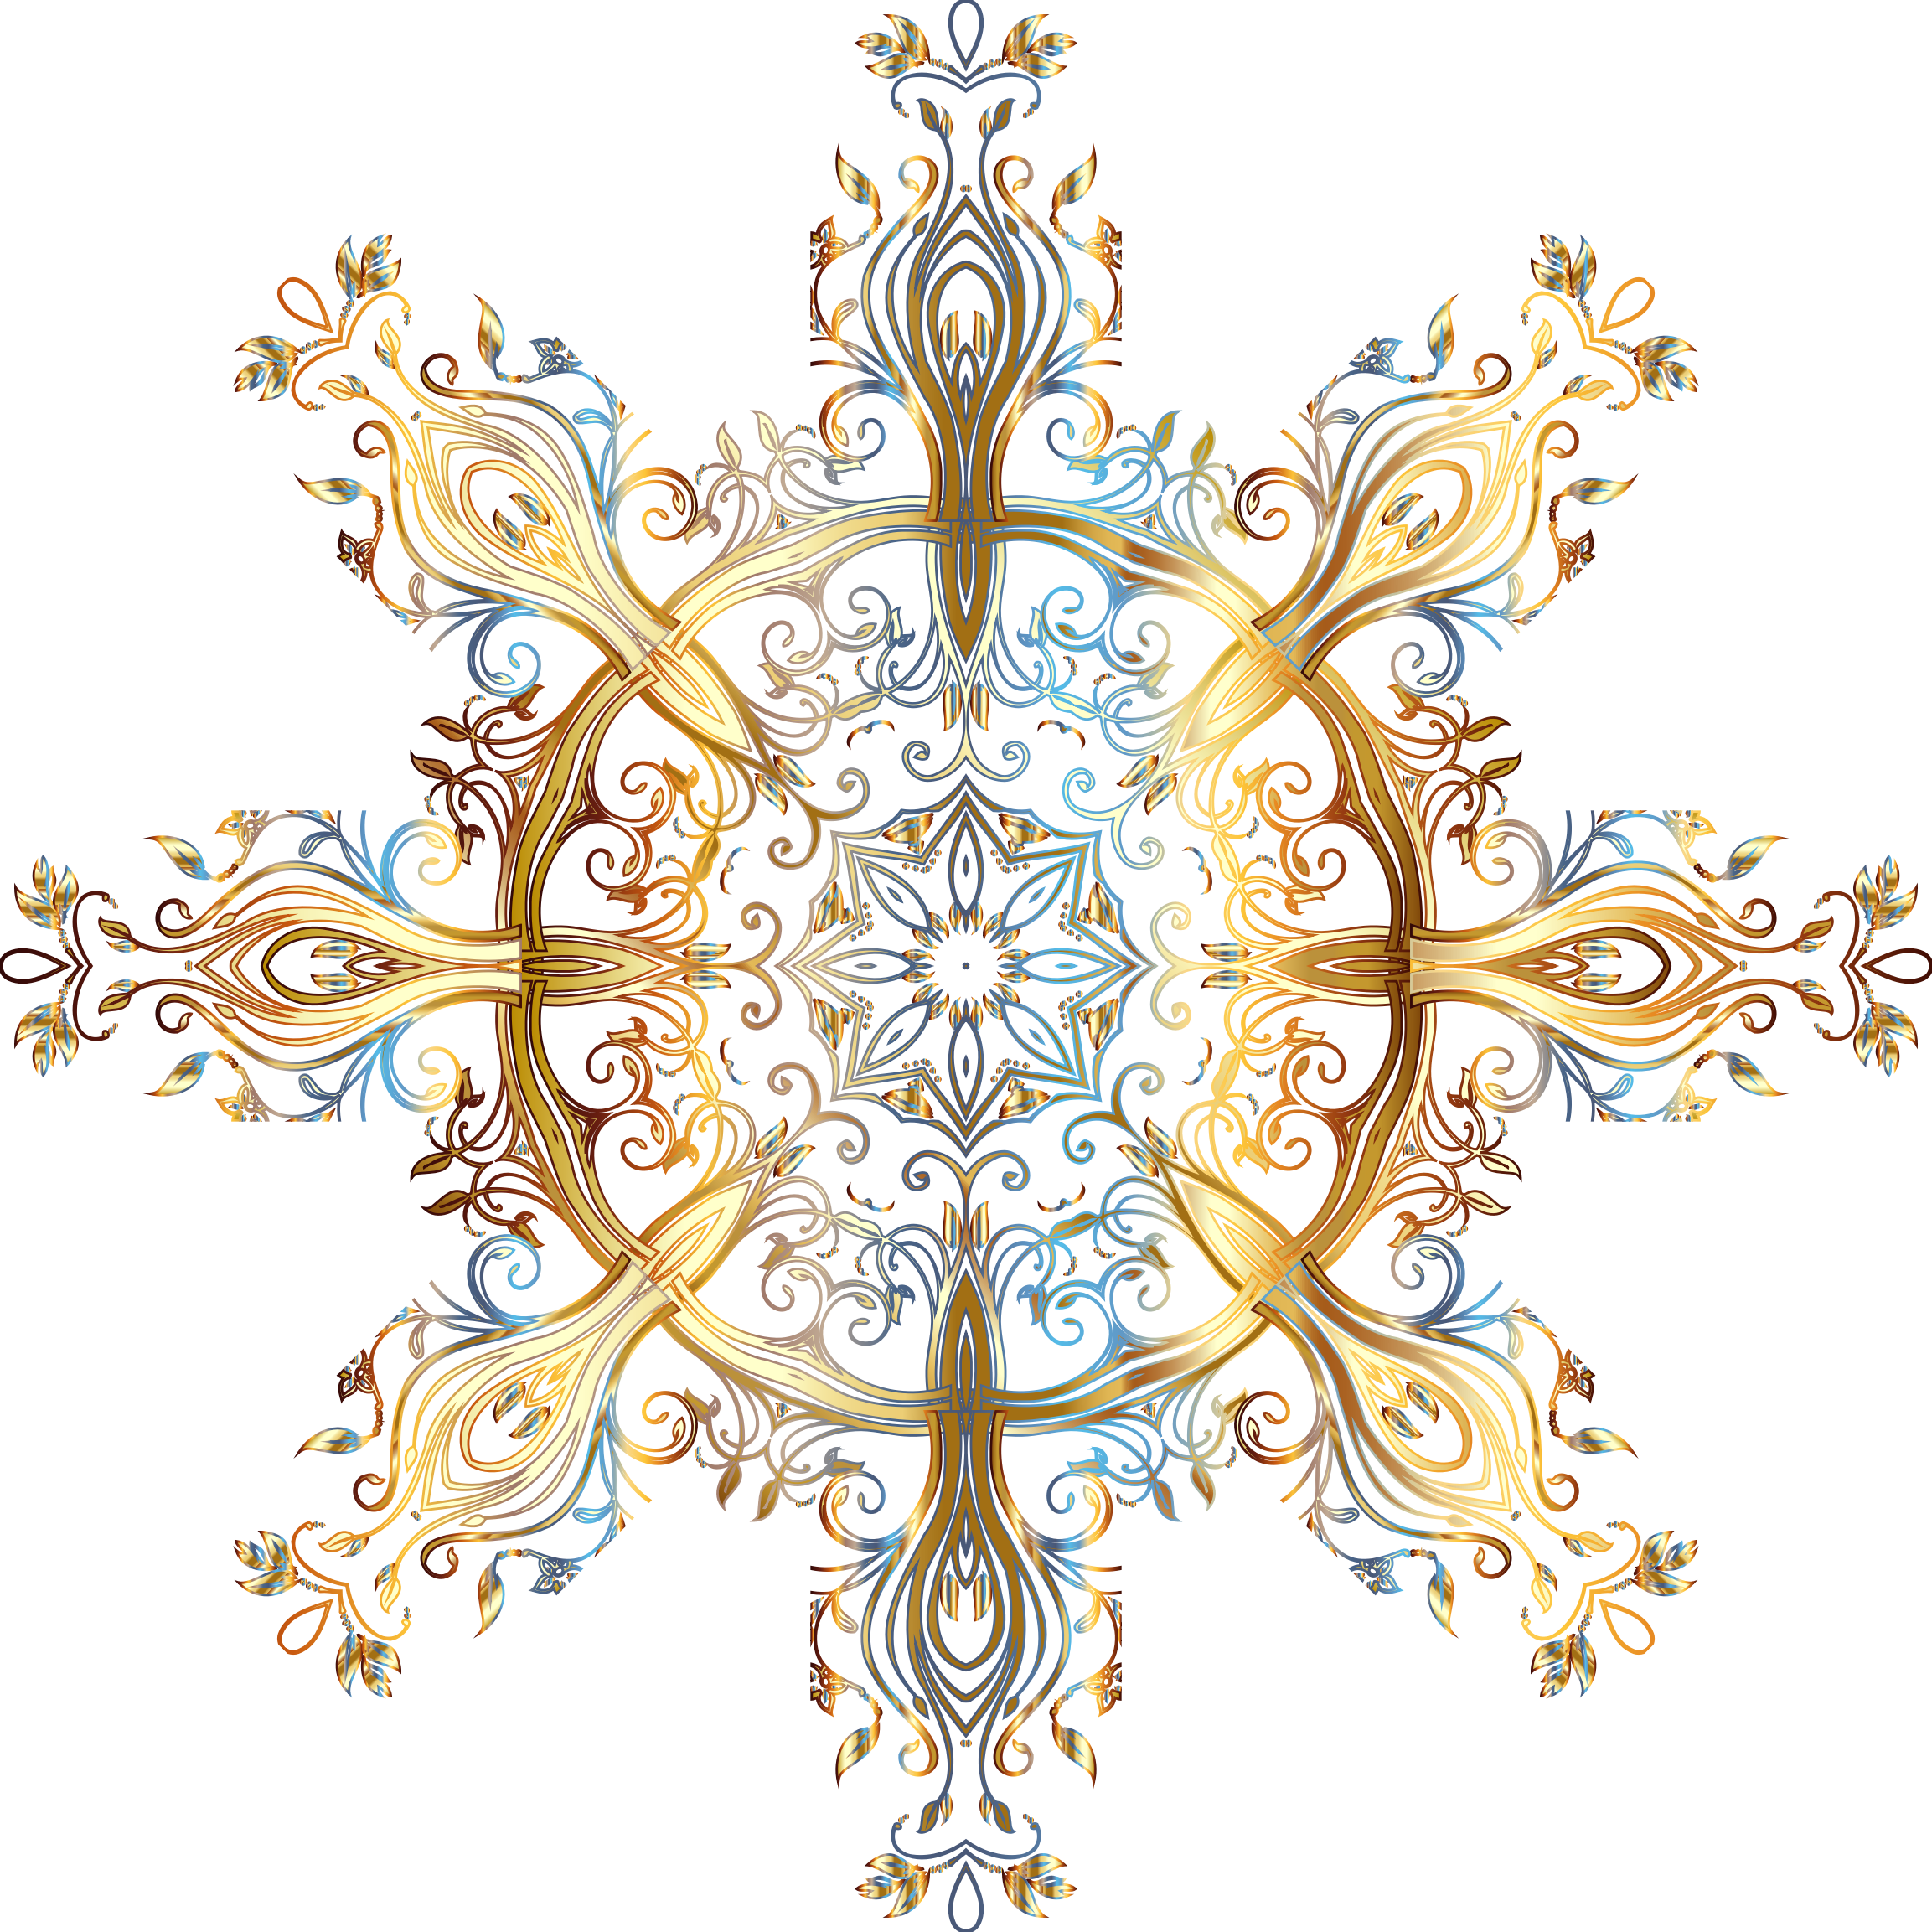 Clipart snowflake flourishes jpg freeuse Clipart - Chromatic Gold Flourish Ornament 4 No Background jpg freeuse